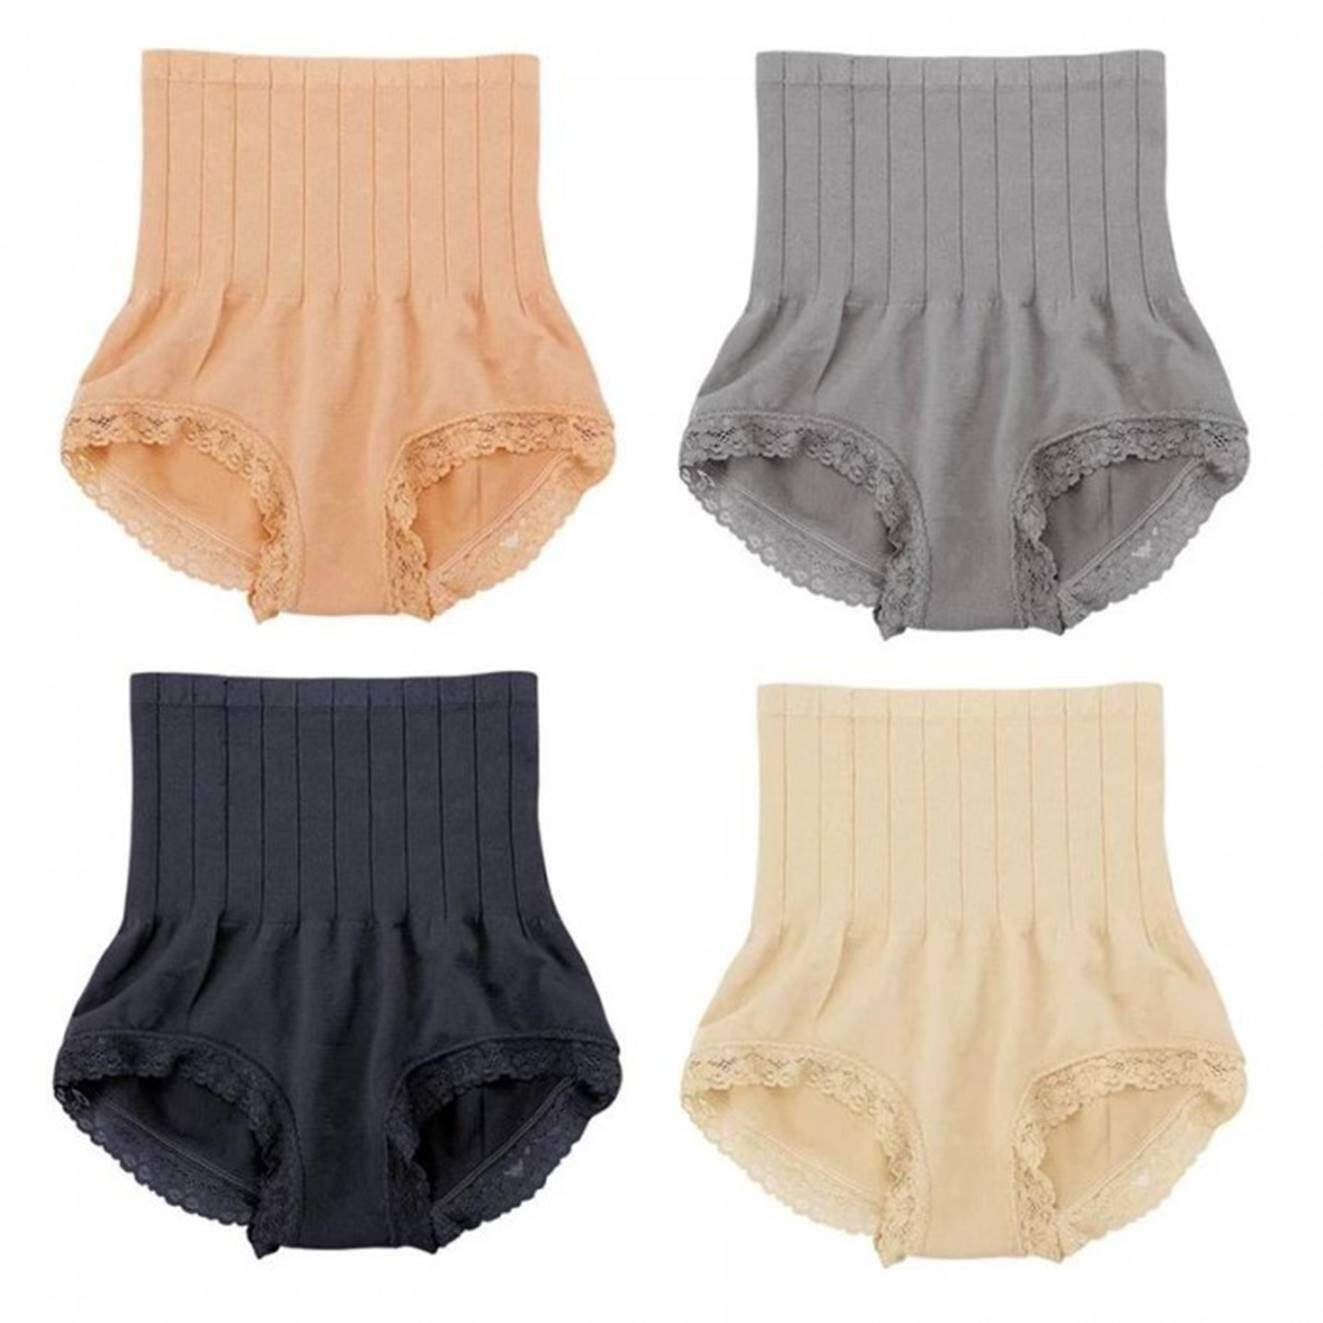 958d7cfb4072d La Belle-Set of 4 MUNAFIE (Japan) Seamless High Waist Flatten Tummyand Hips  Lifting Panties - Black